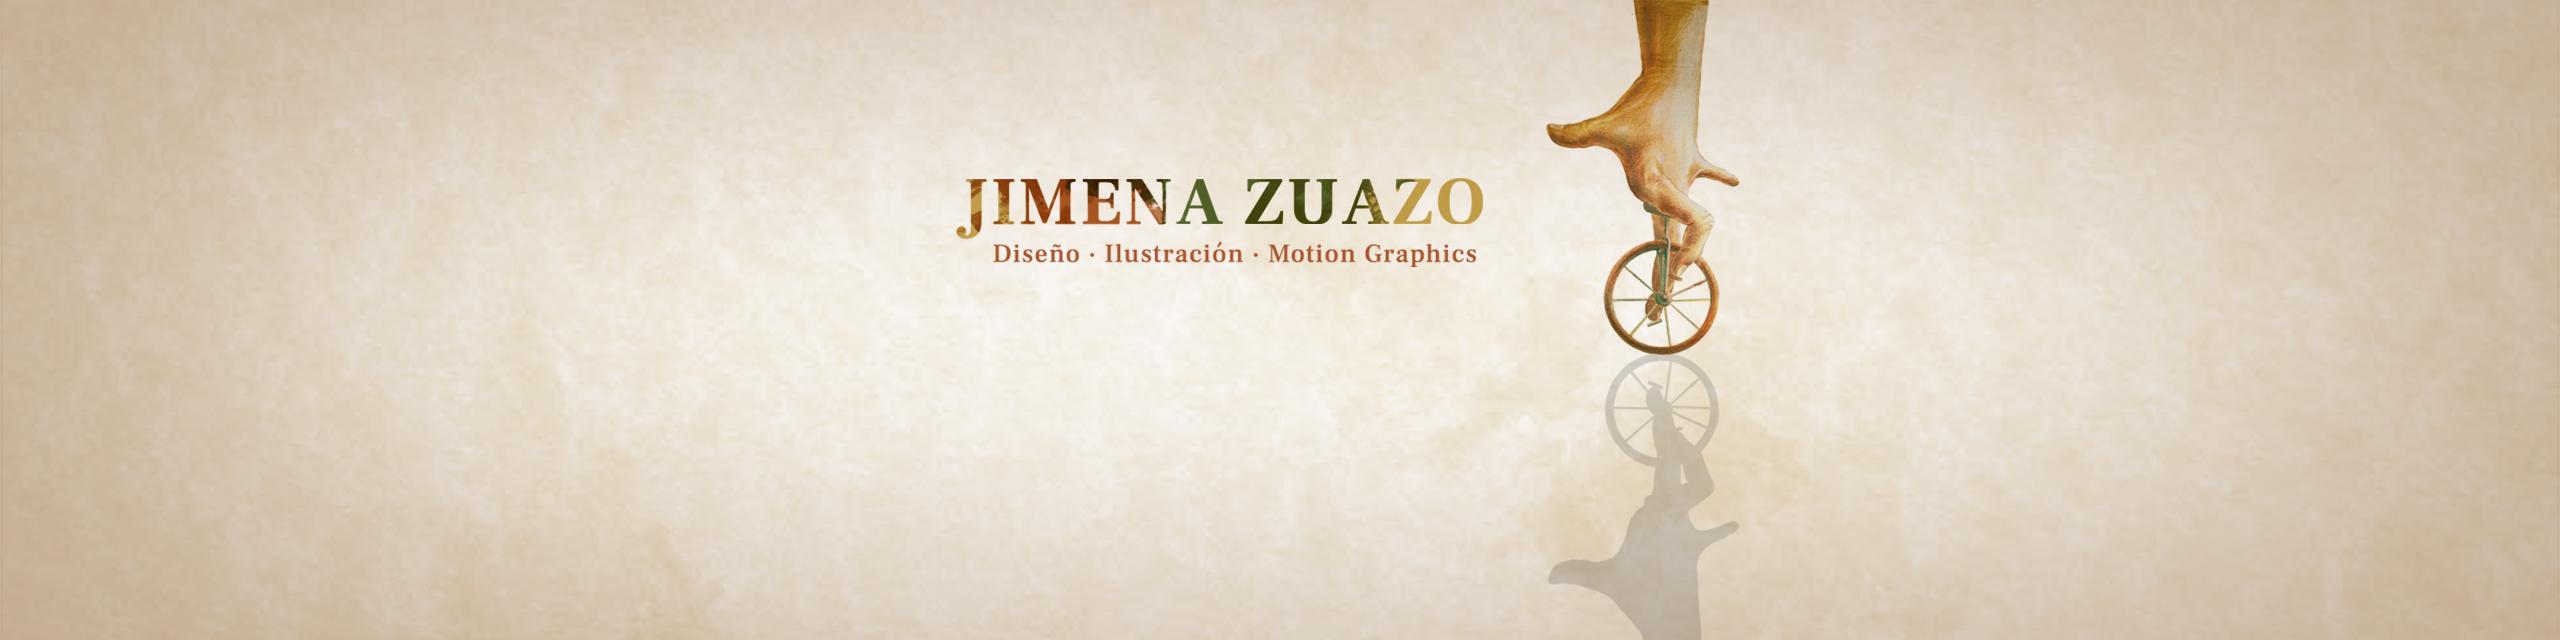 Jimena Zuazo